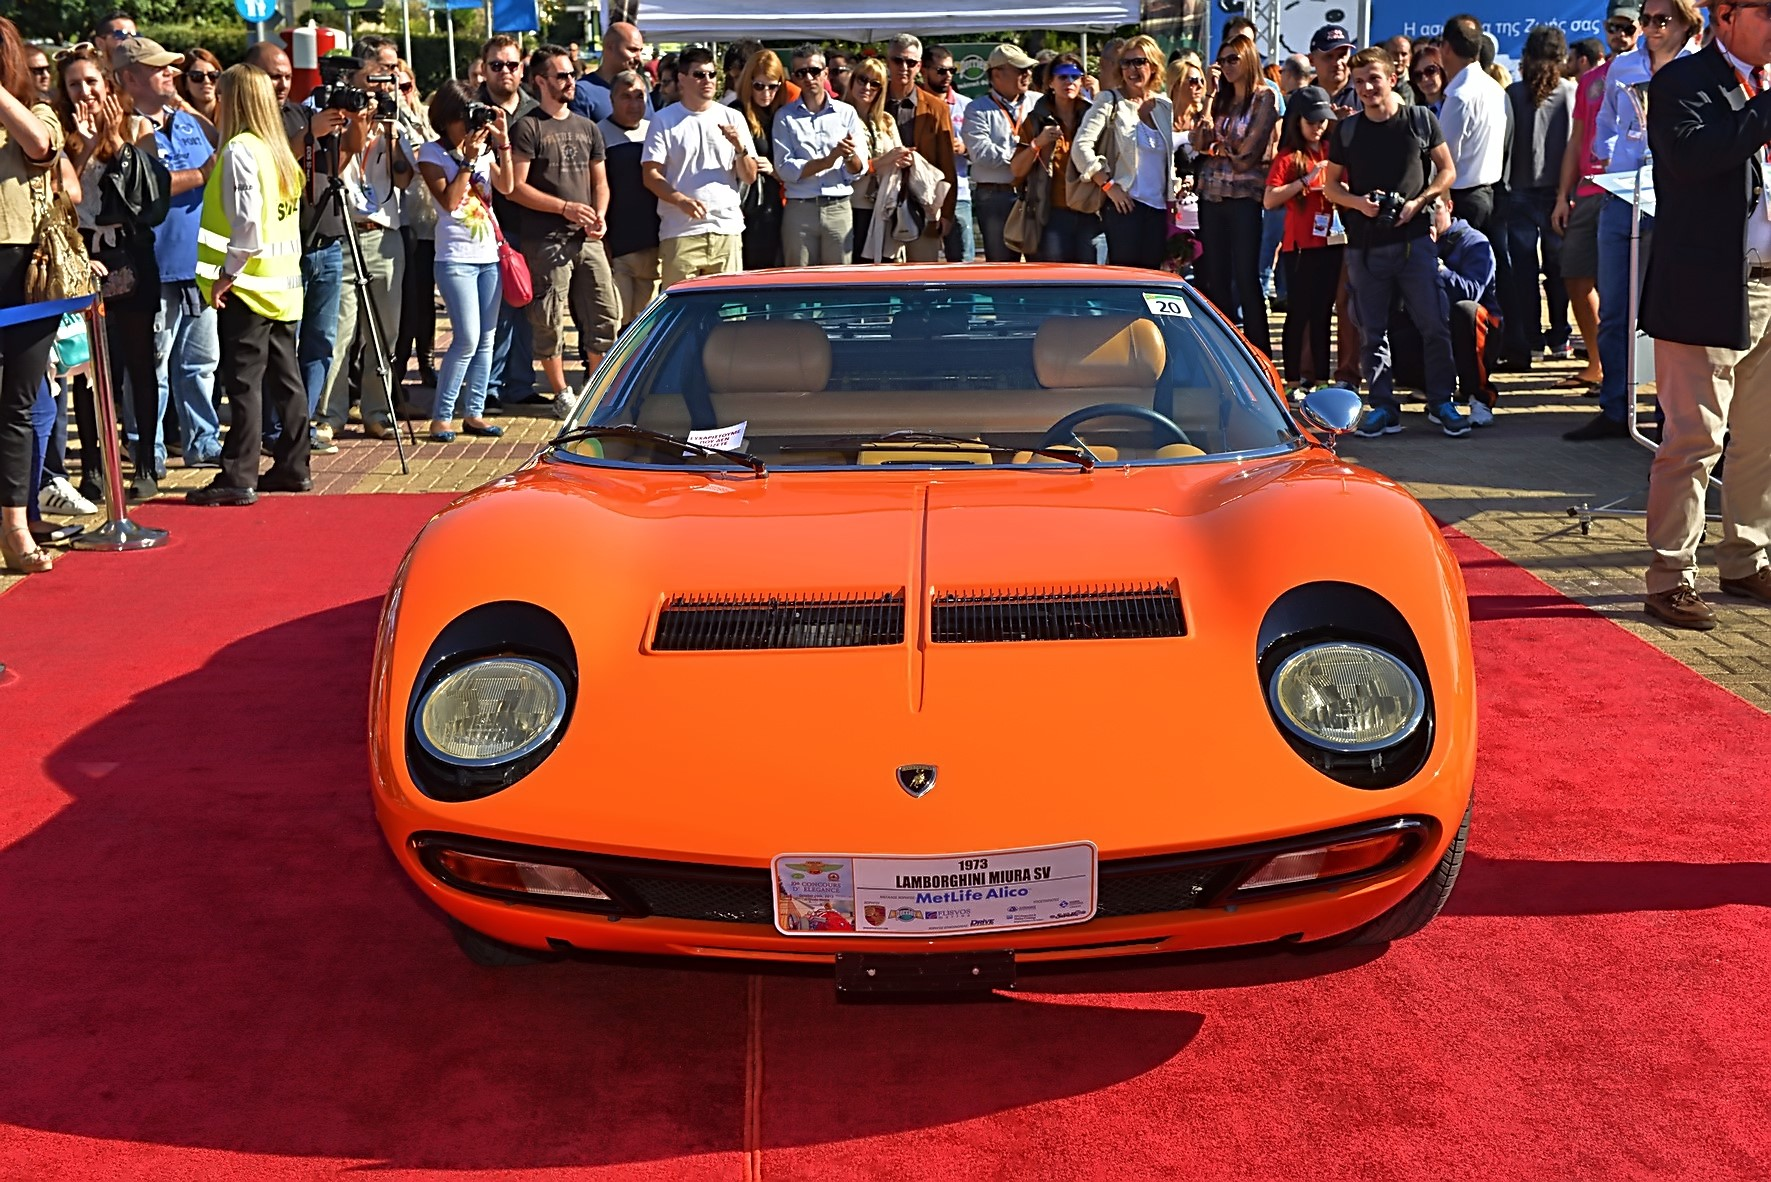 1973 Lamborghini Miura P400 SV (3).jpg